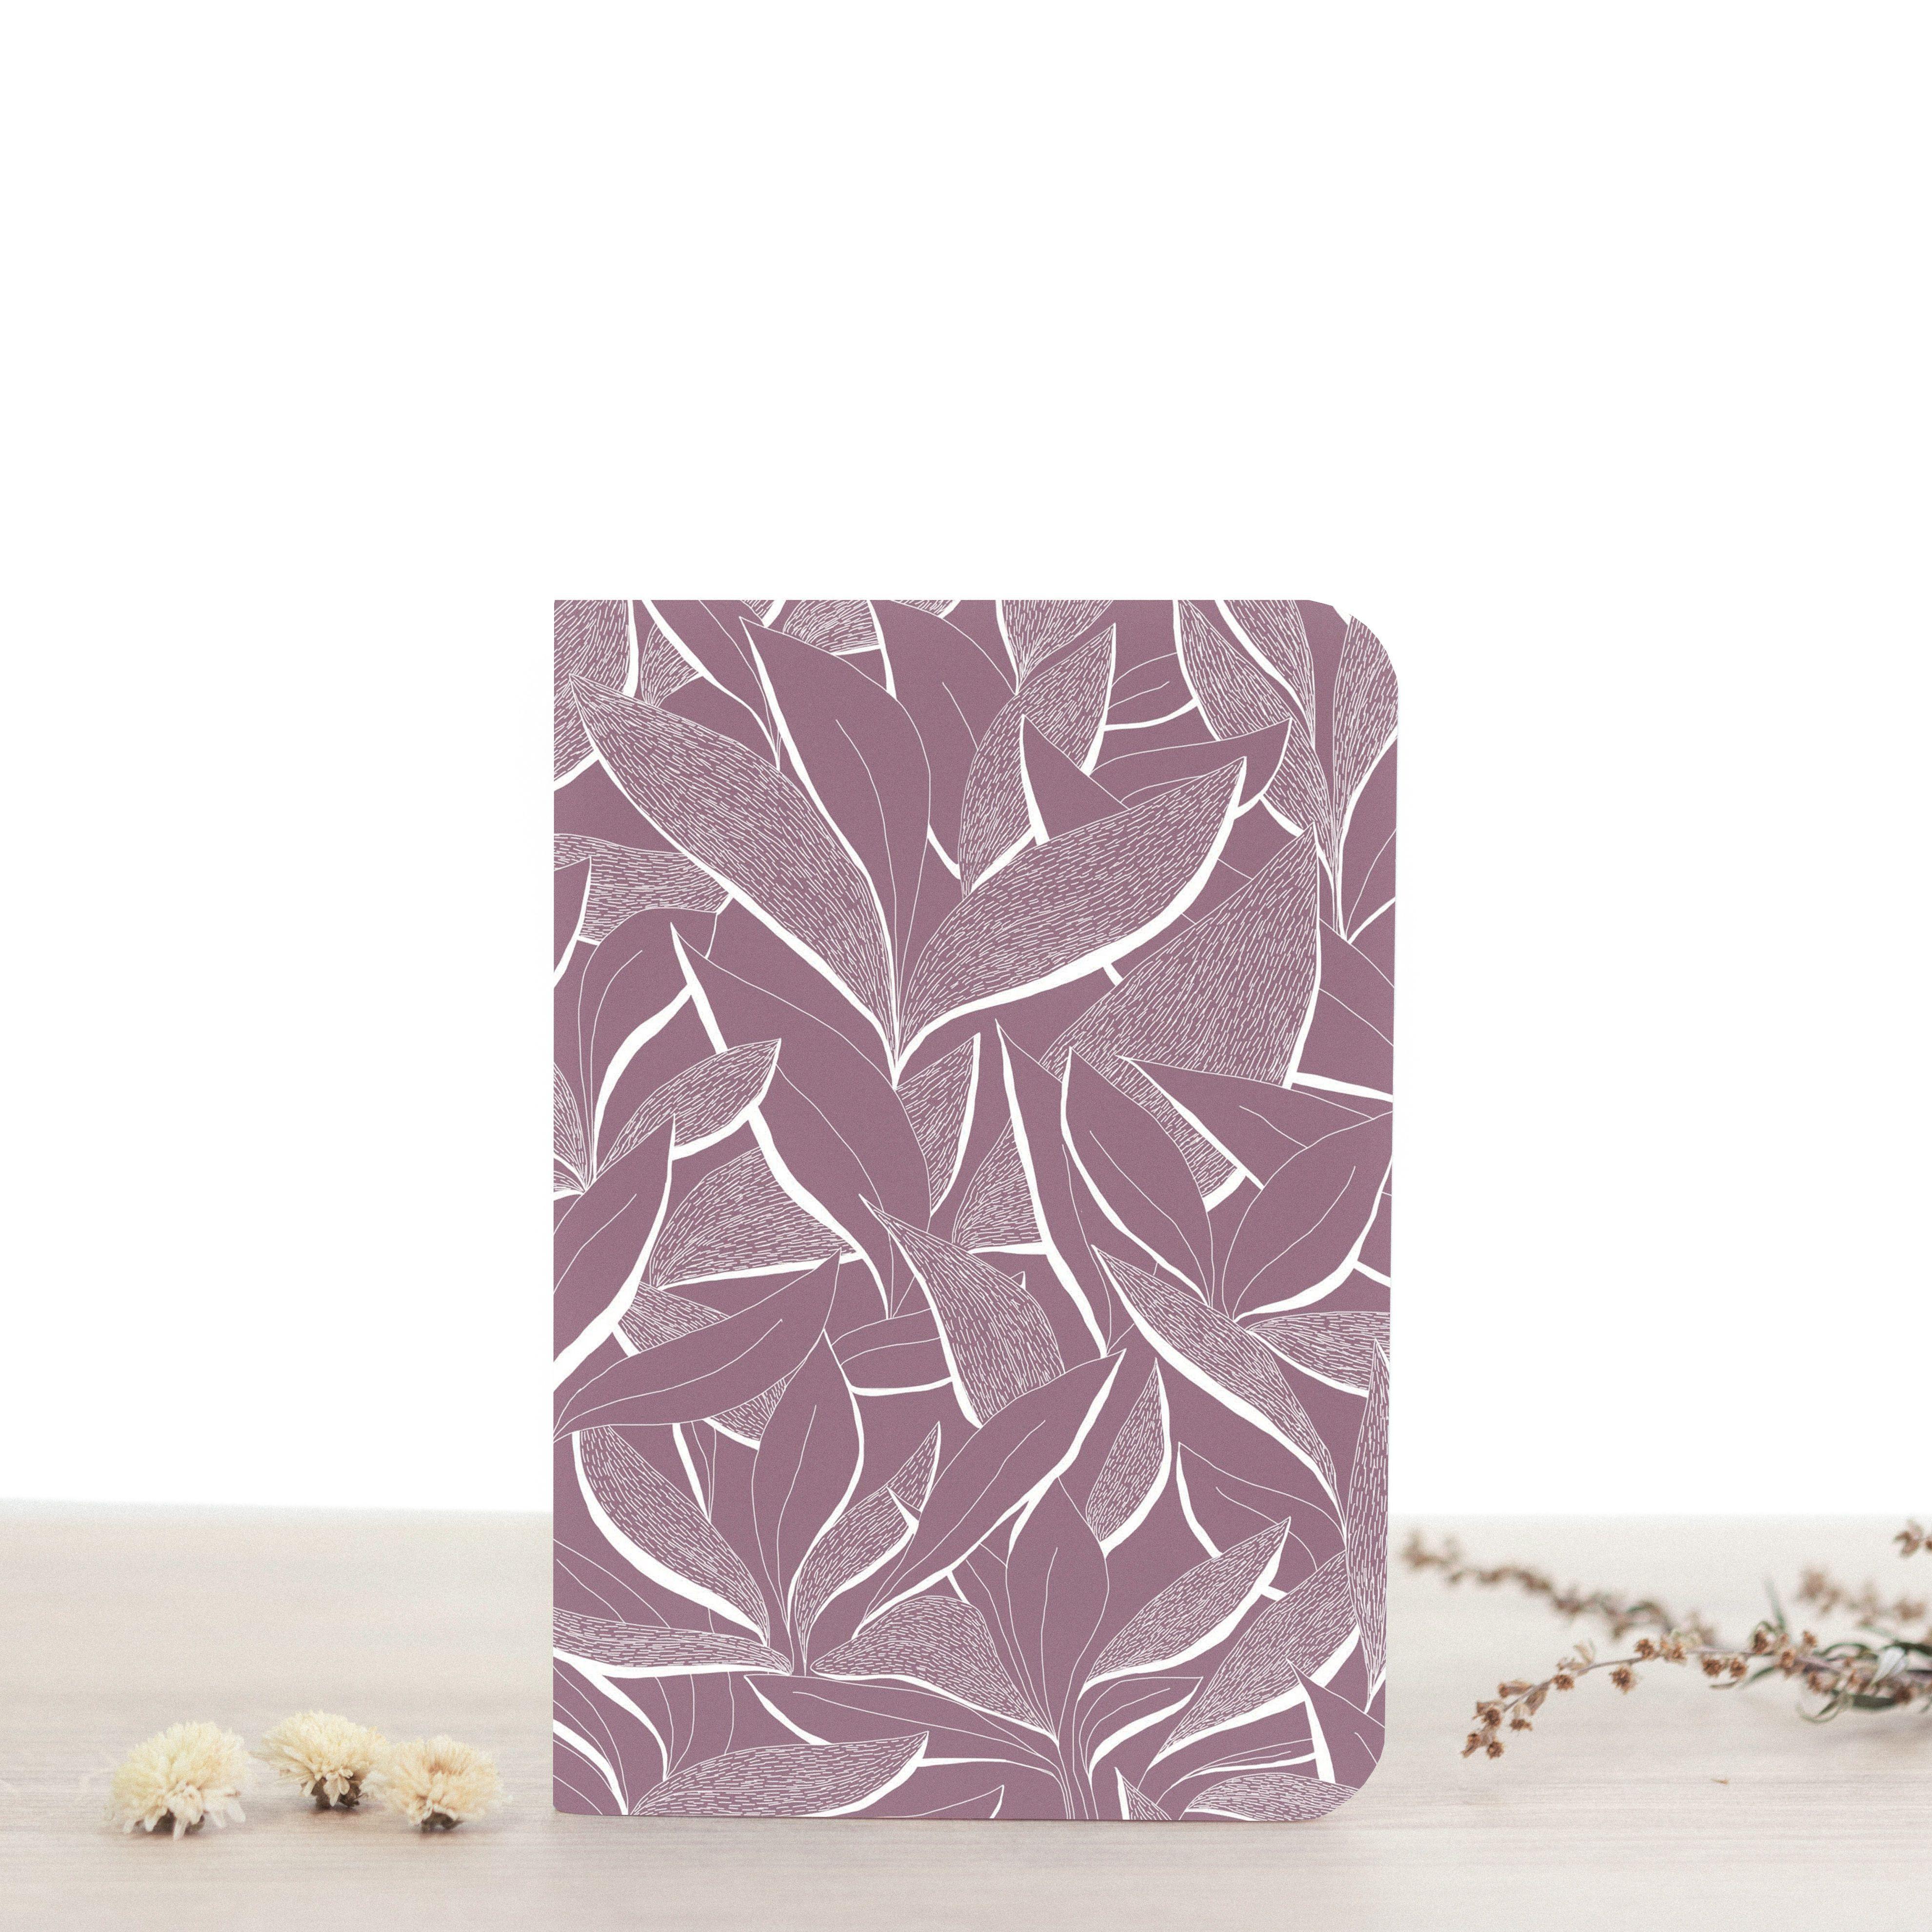 Atelier Bobbie A6 Notebook - Antonin - Ruled